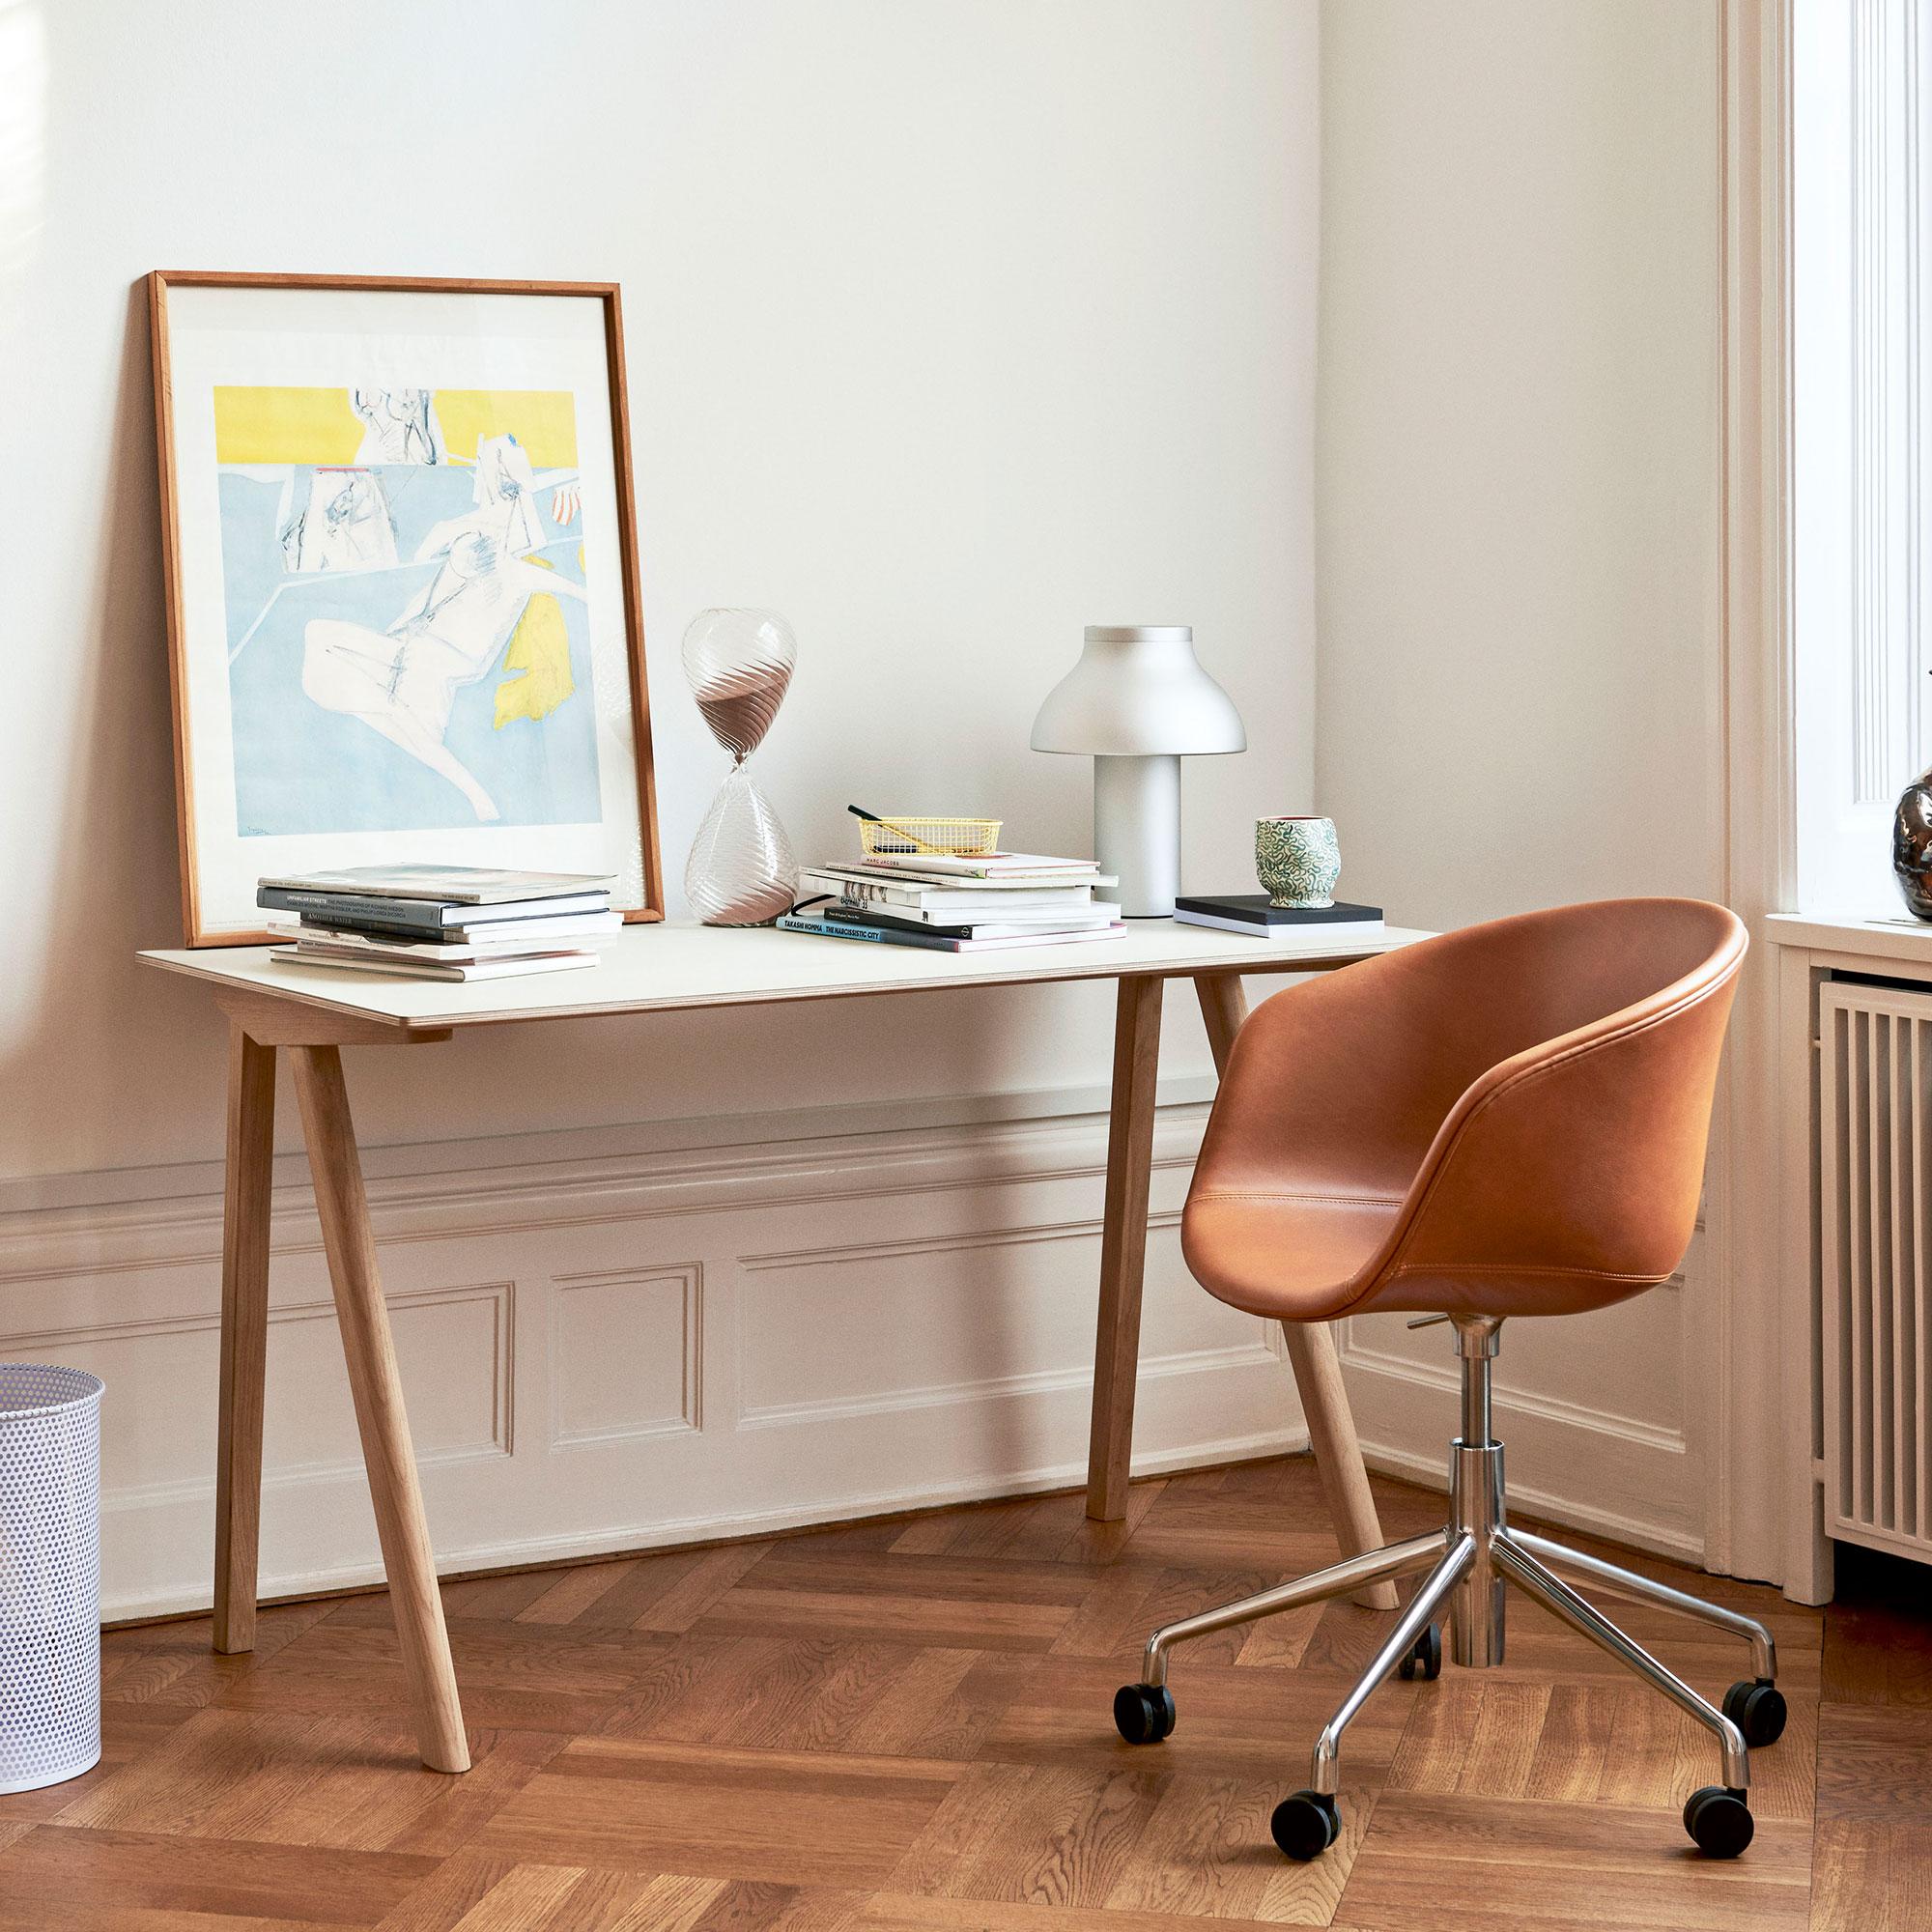 Copenhague CPH 90 130x65 cm Off White Linoleum Matt Lacquered Oak Base